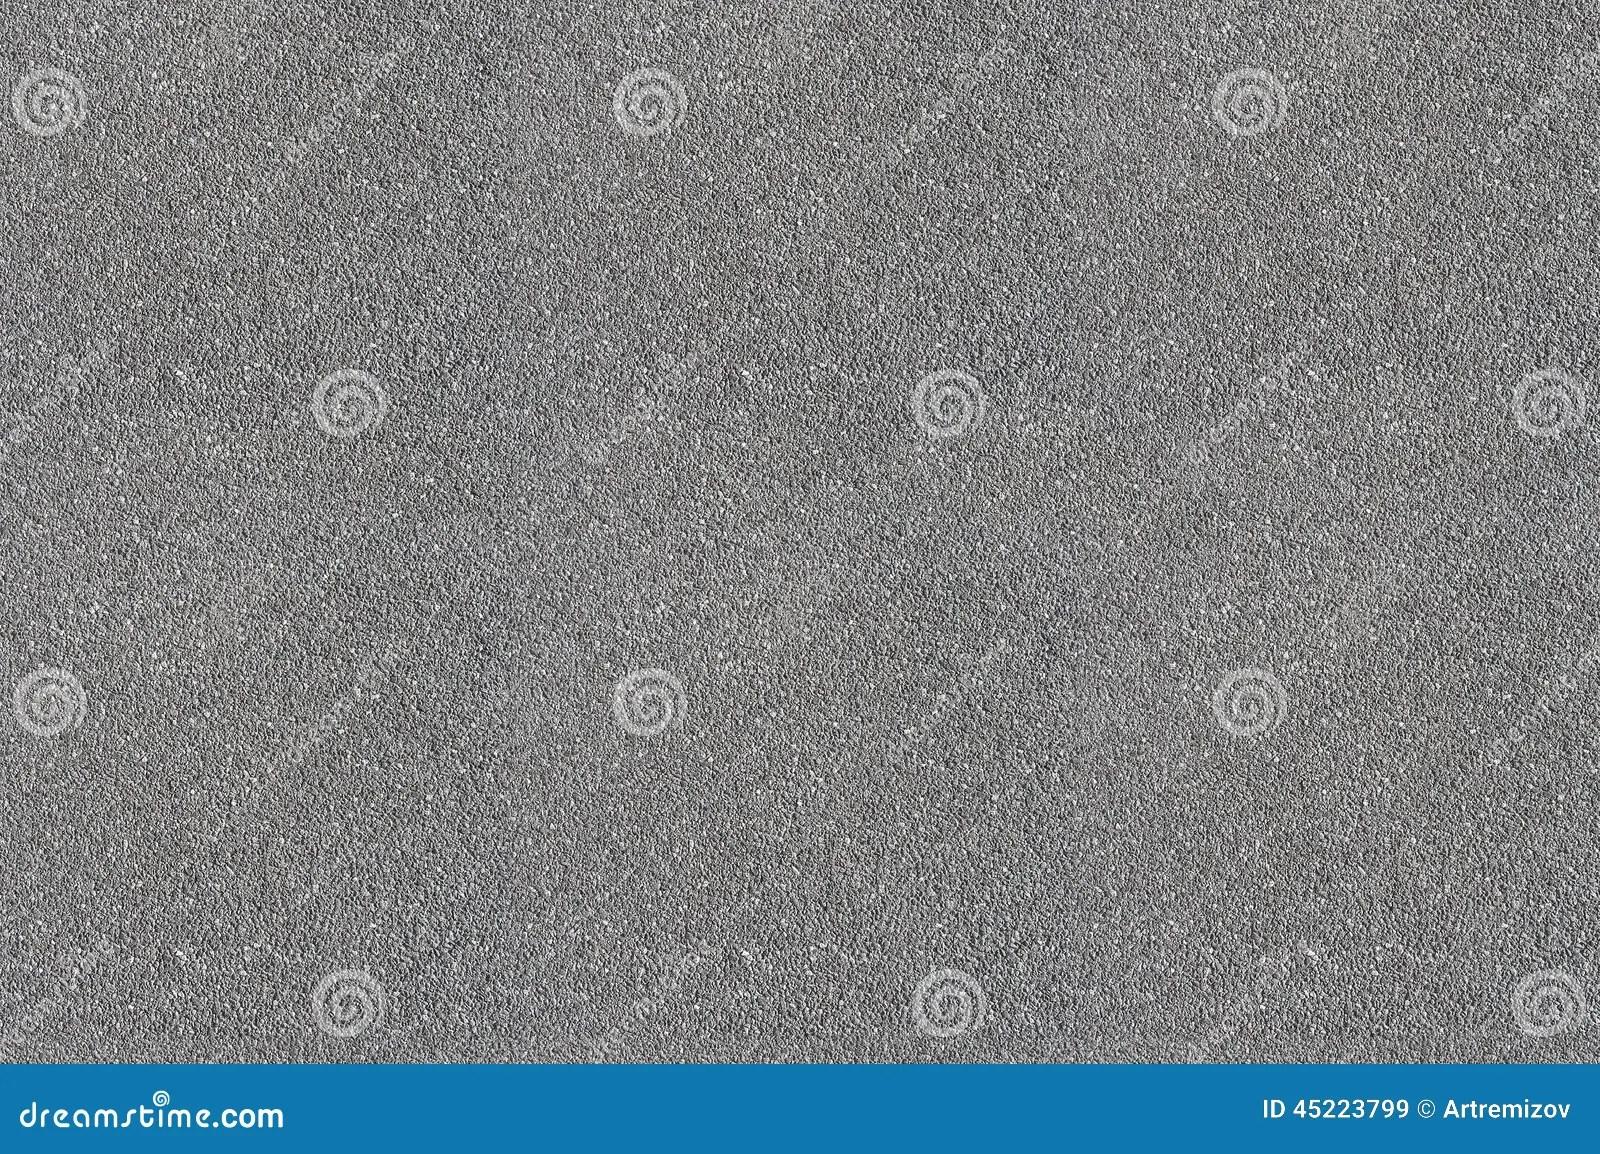 Asphalt Road Surface Background Texture 9 Stock Photo